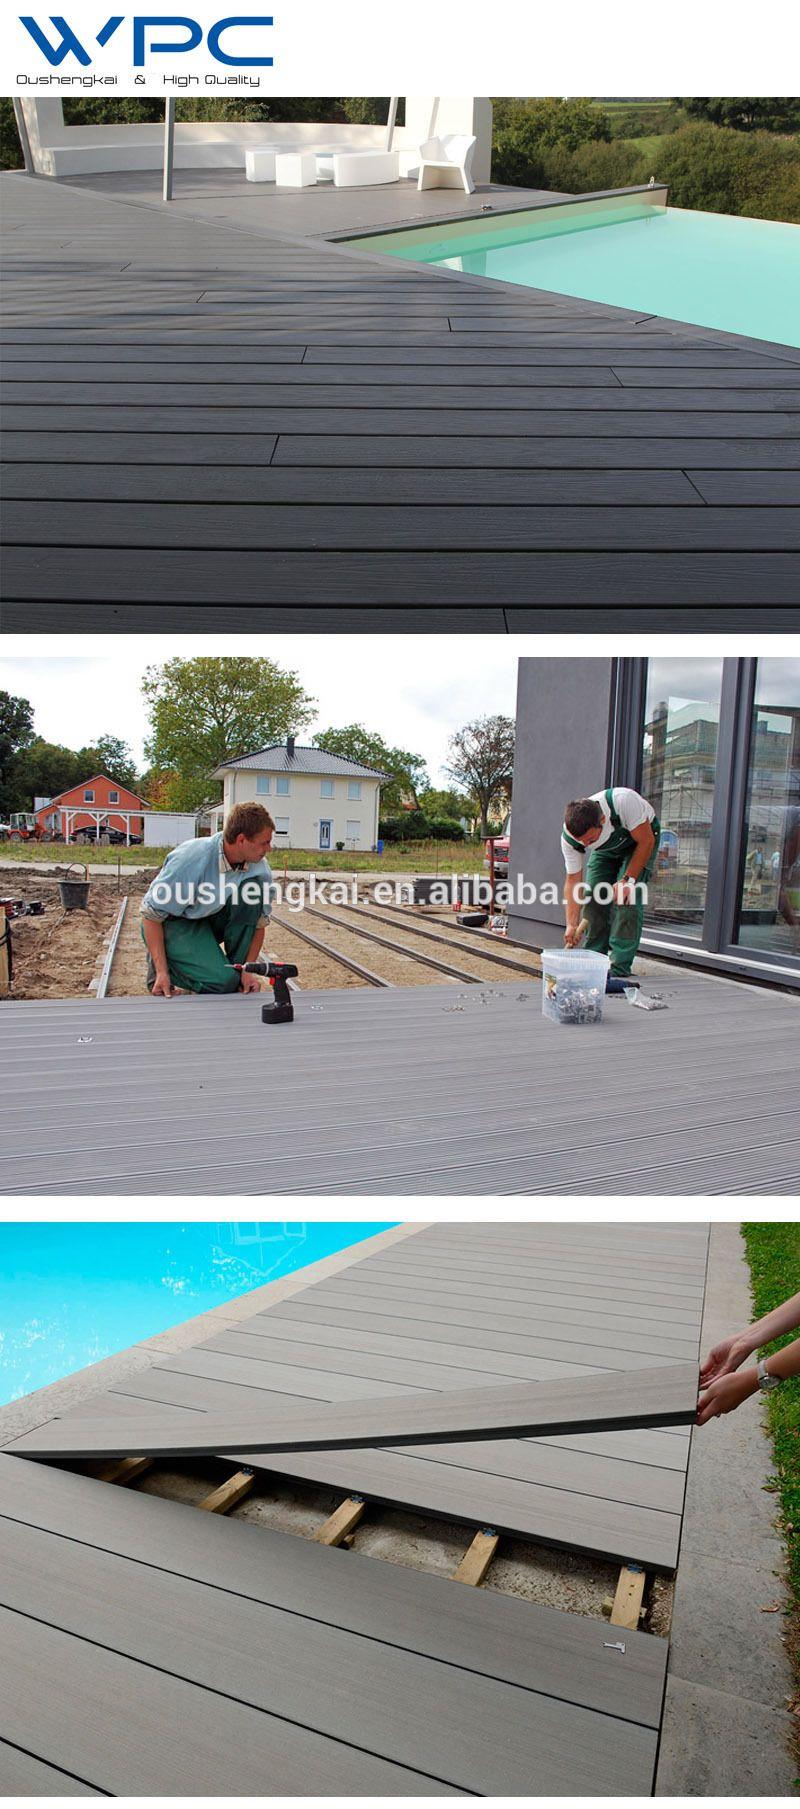 Cheap Price WPC Waterproof Outdoor Deck Flooring, View